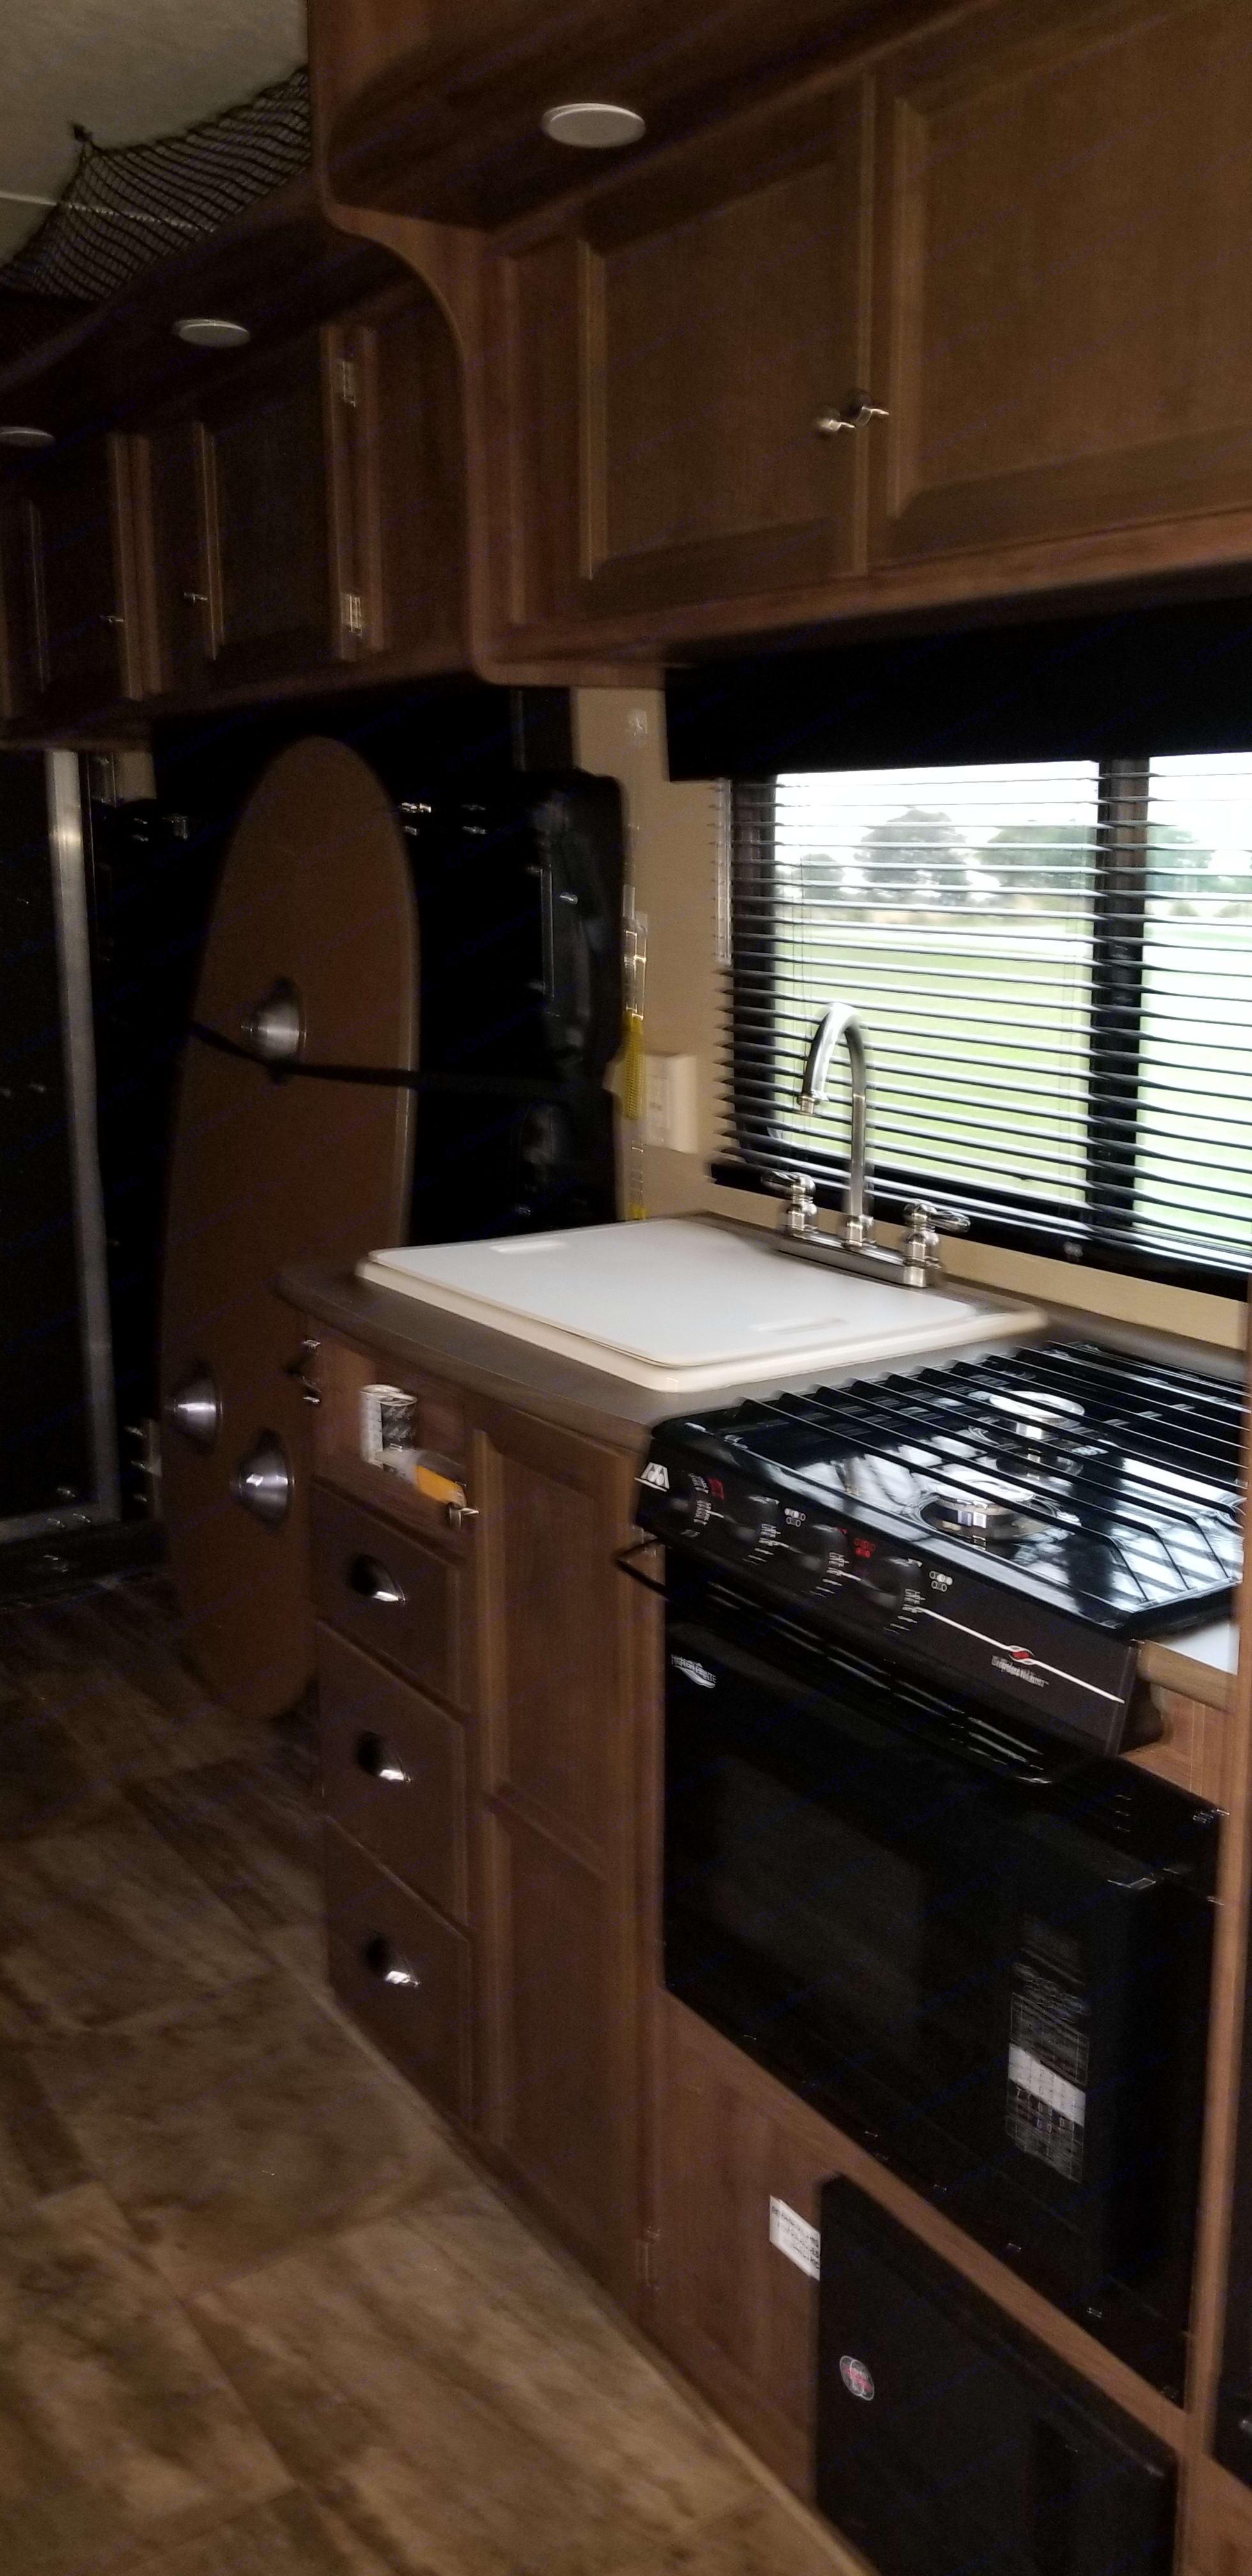 Kitchen. Sink, stove, microwave. Dutchmen Rubicon 2015